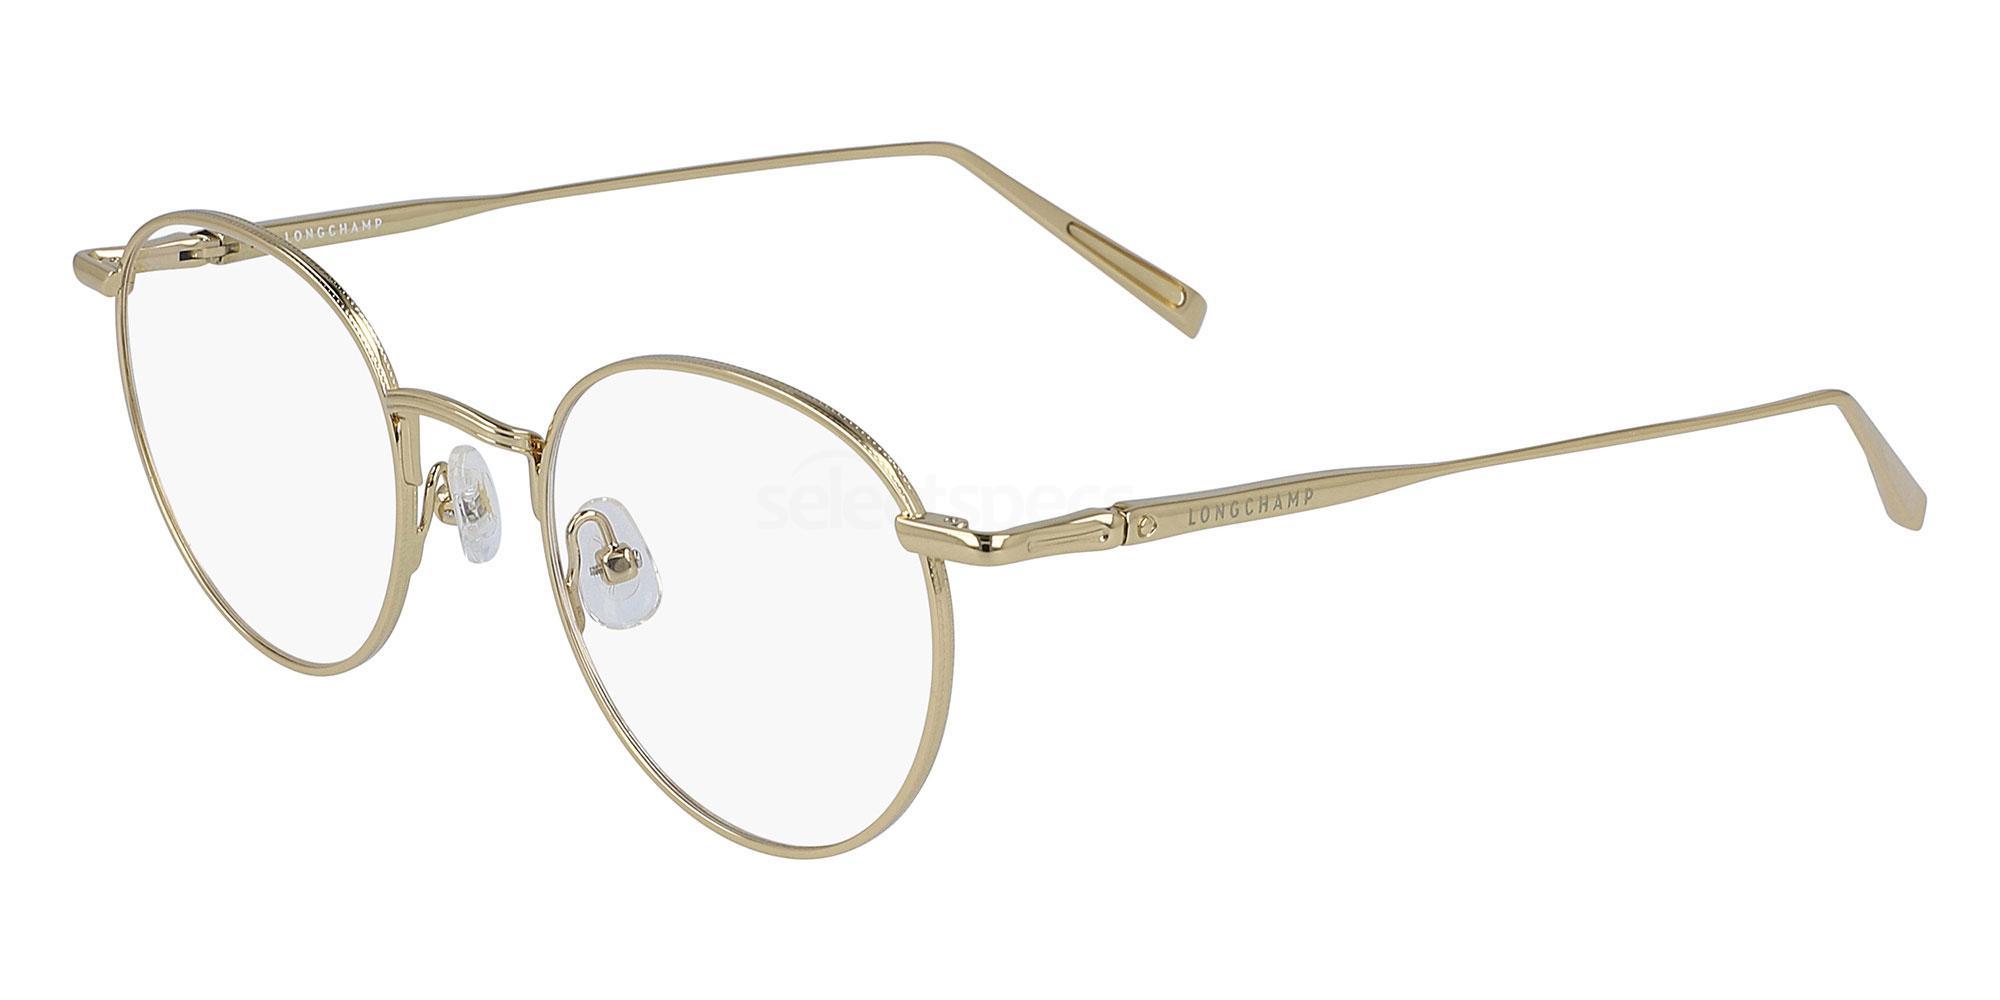 713 LO2112 Glasses, LONGCHAMP